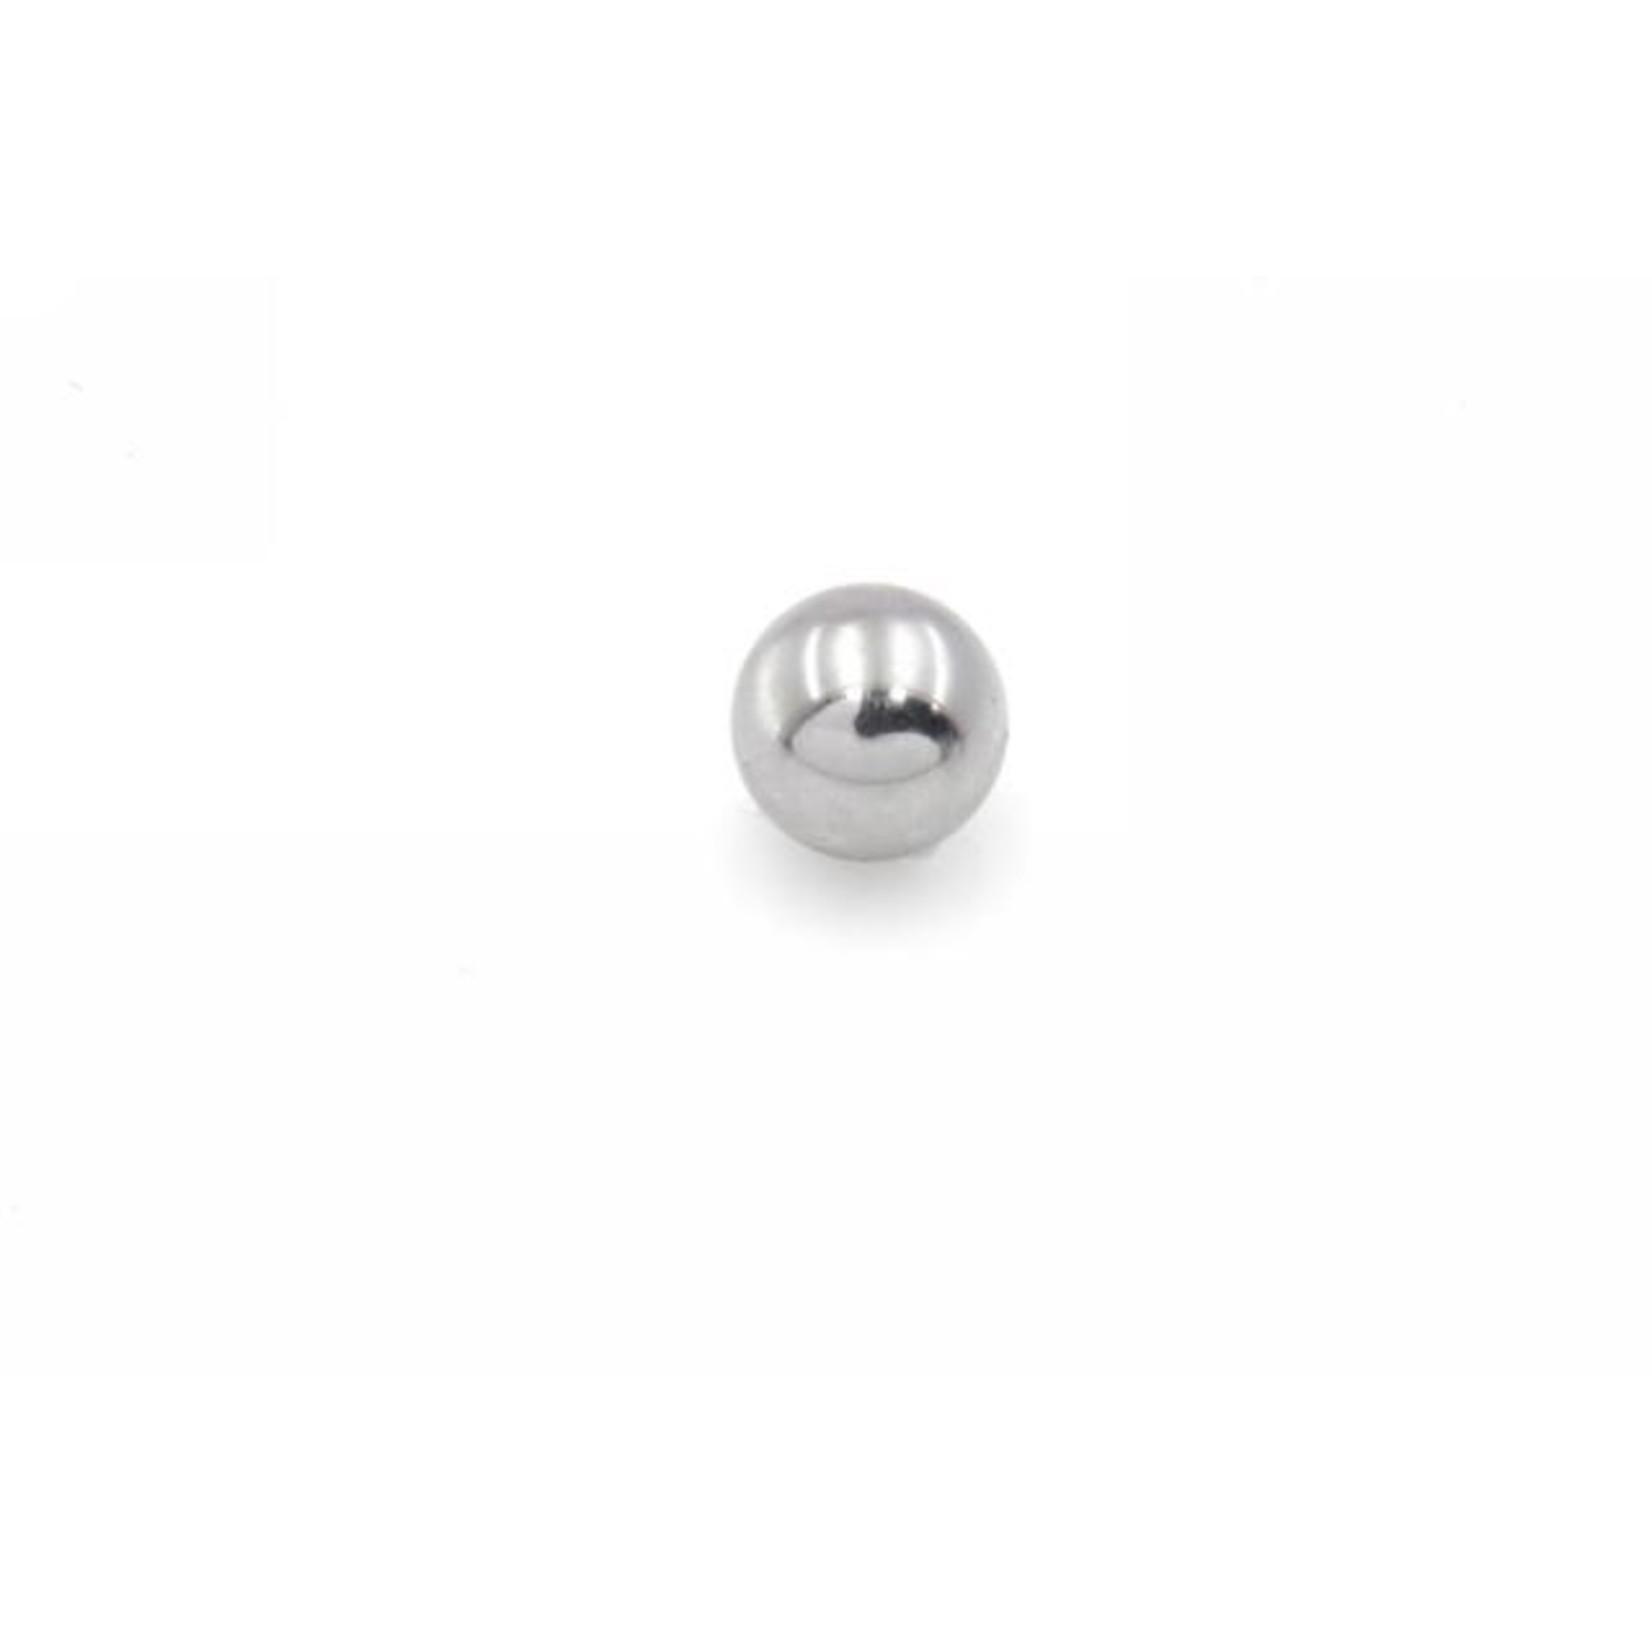 Kogel veercilinderstang 60-75 15,875mm Nr Org: 24108009